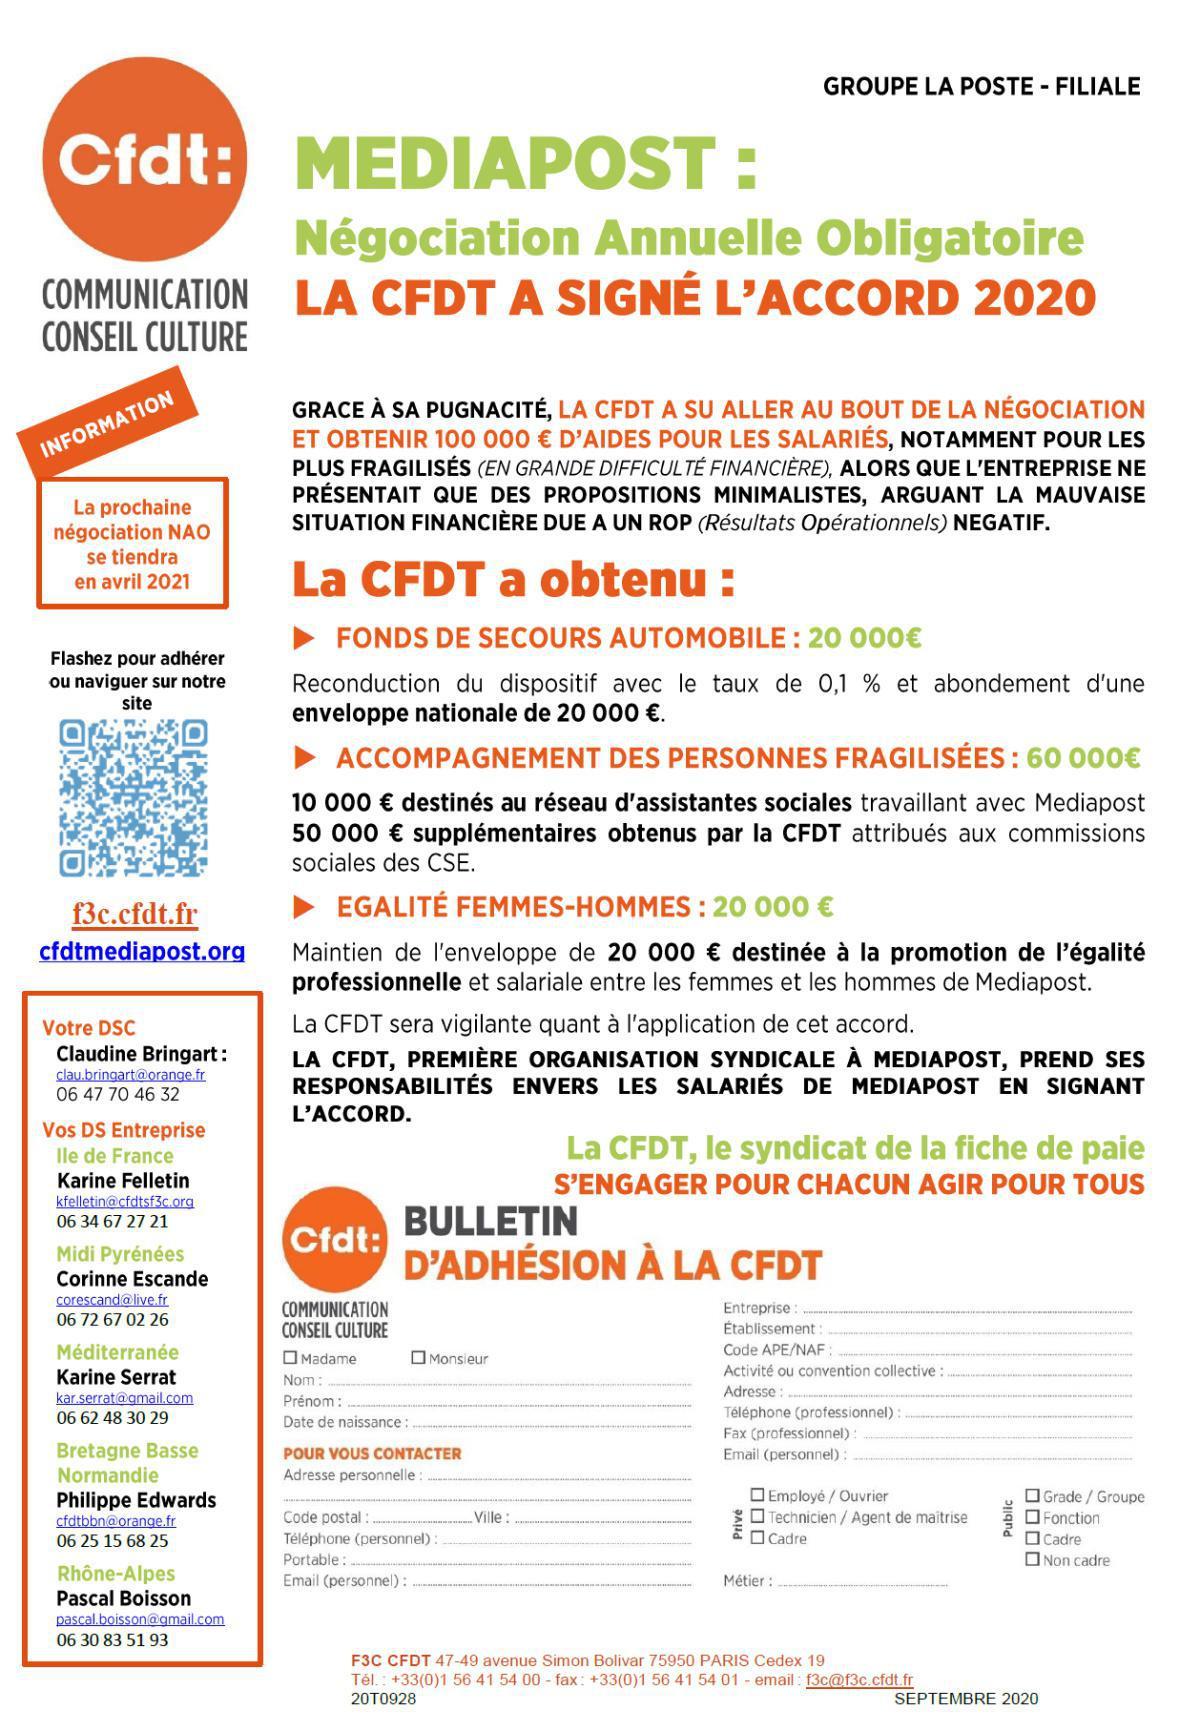 Mediapost : Négociation Annuelle Obligatoire, la CFDT signe l'accord 2020